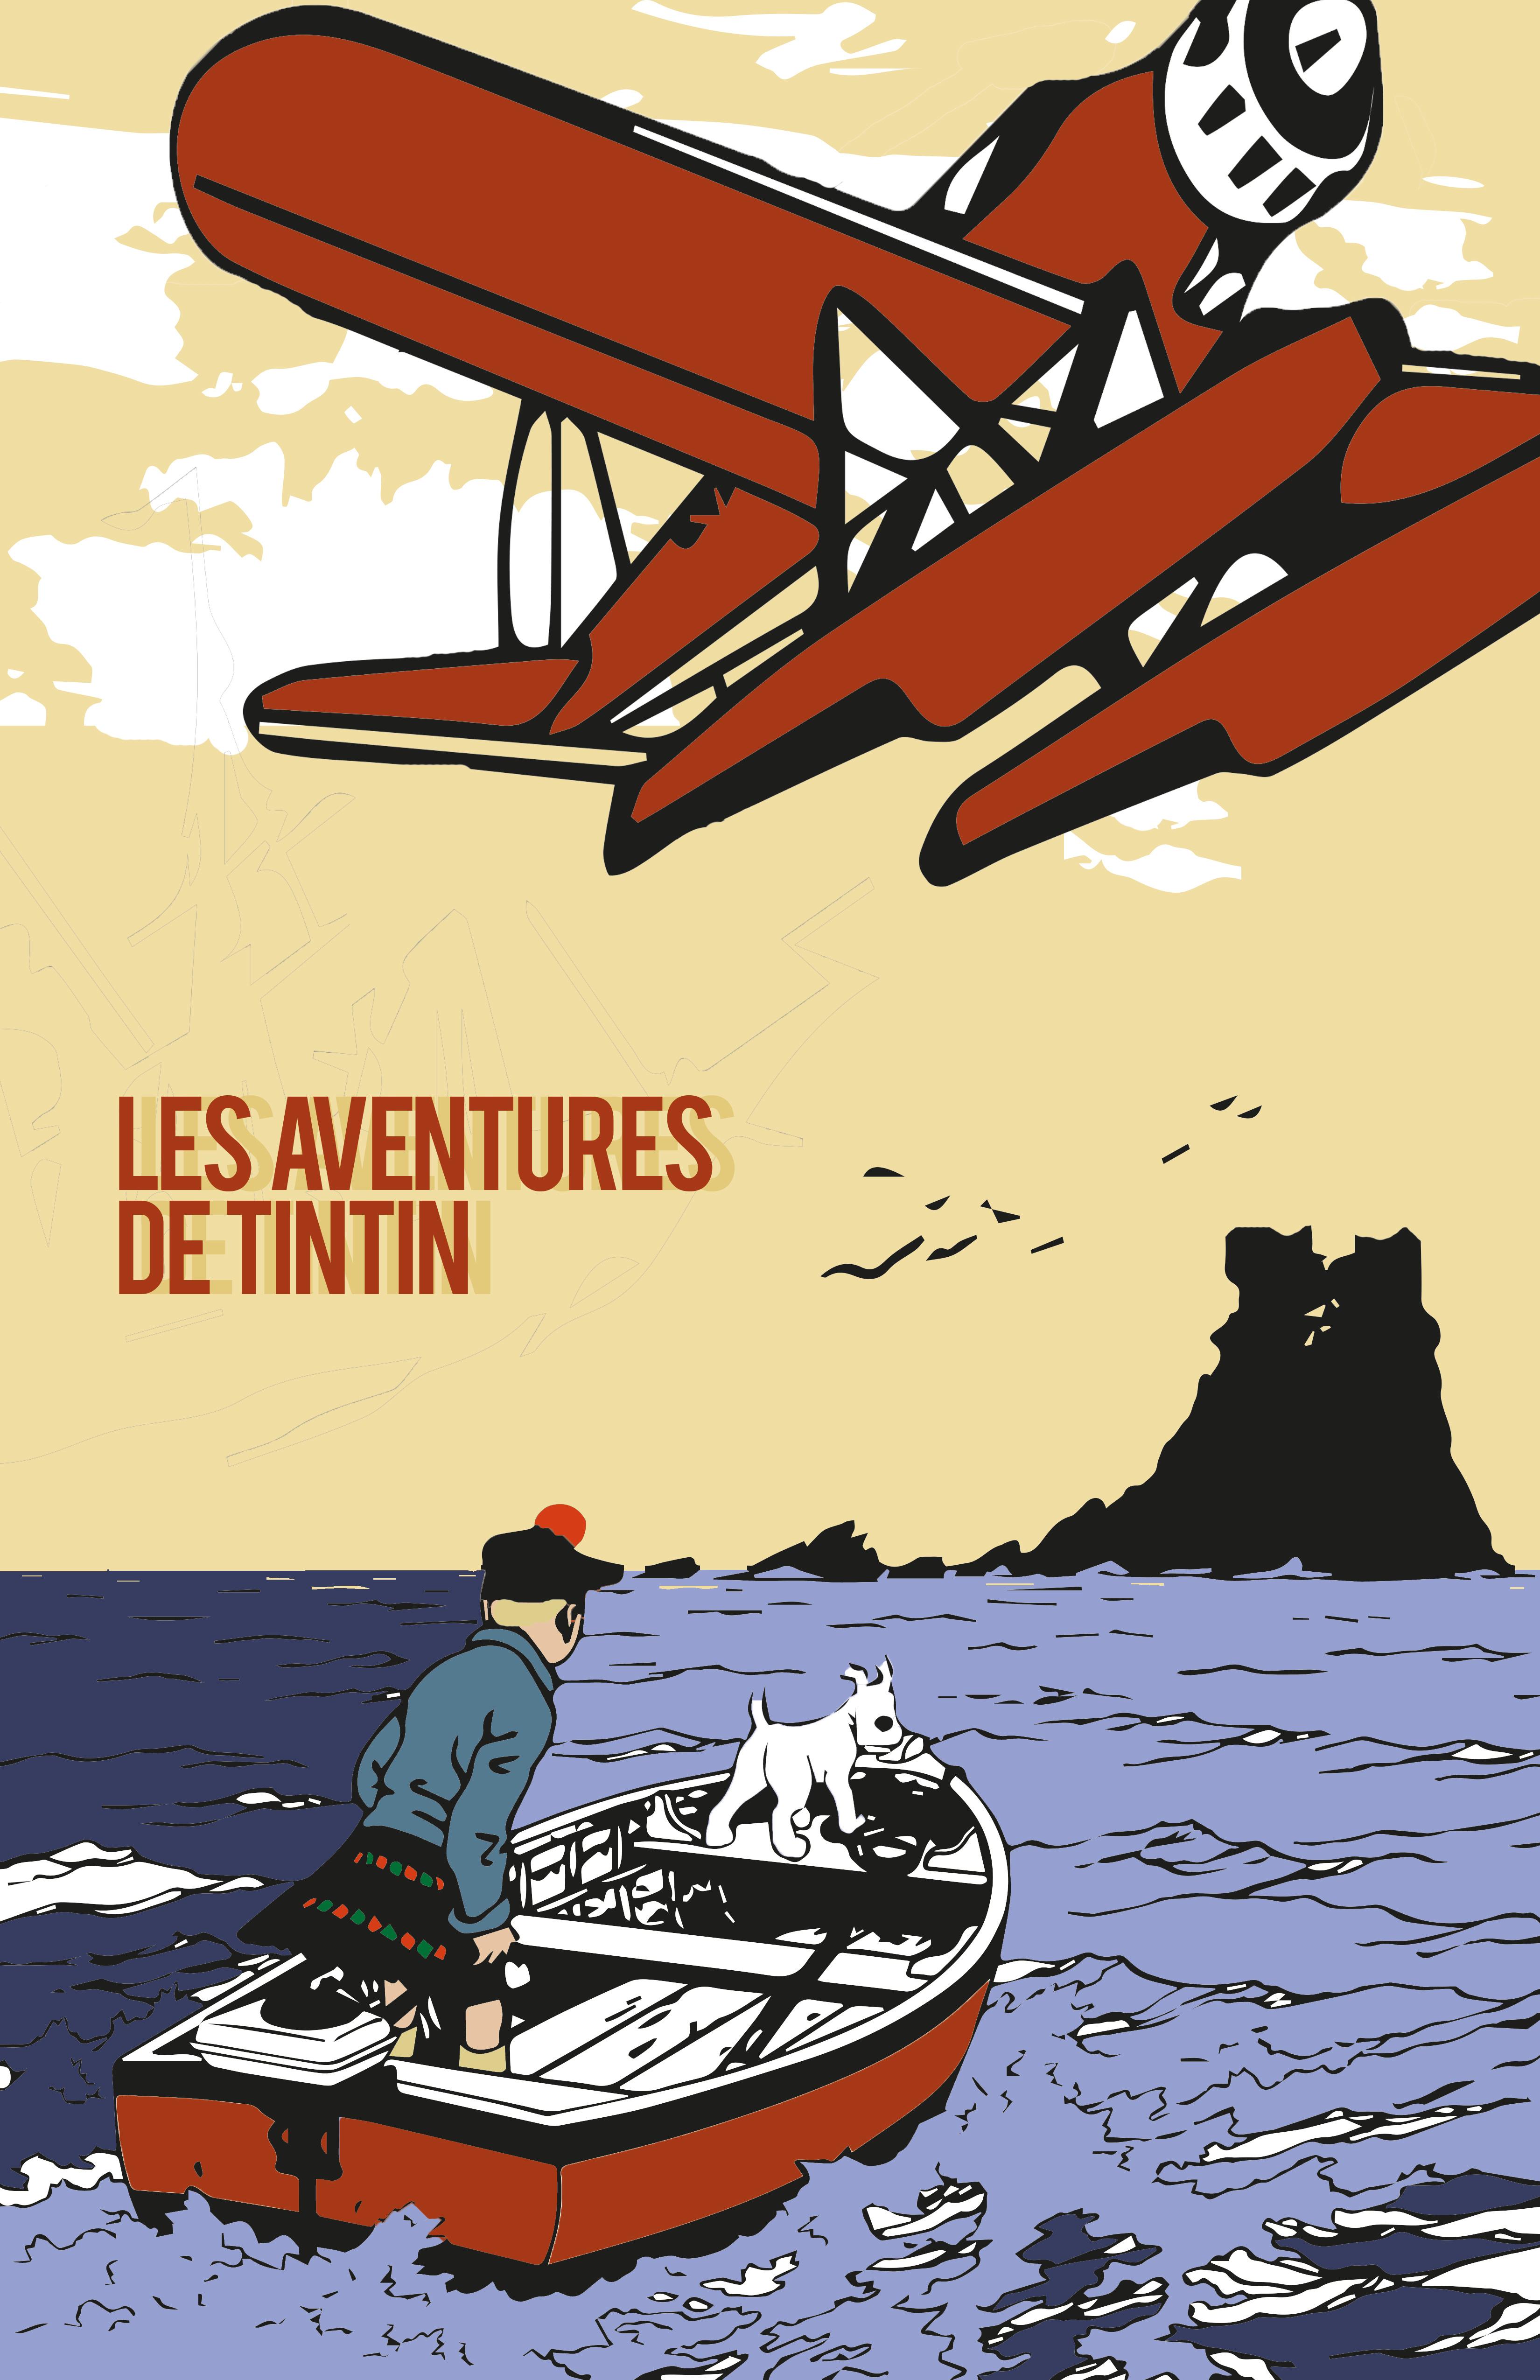 Les Aventures de Tintin (2018)